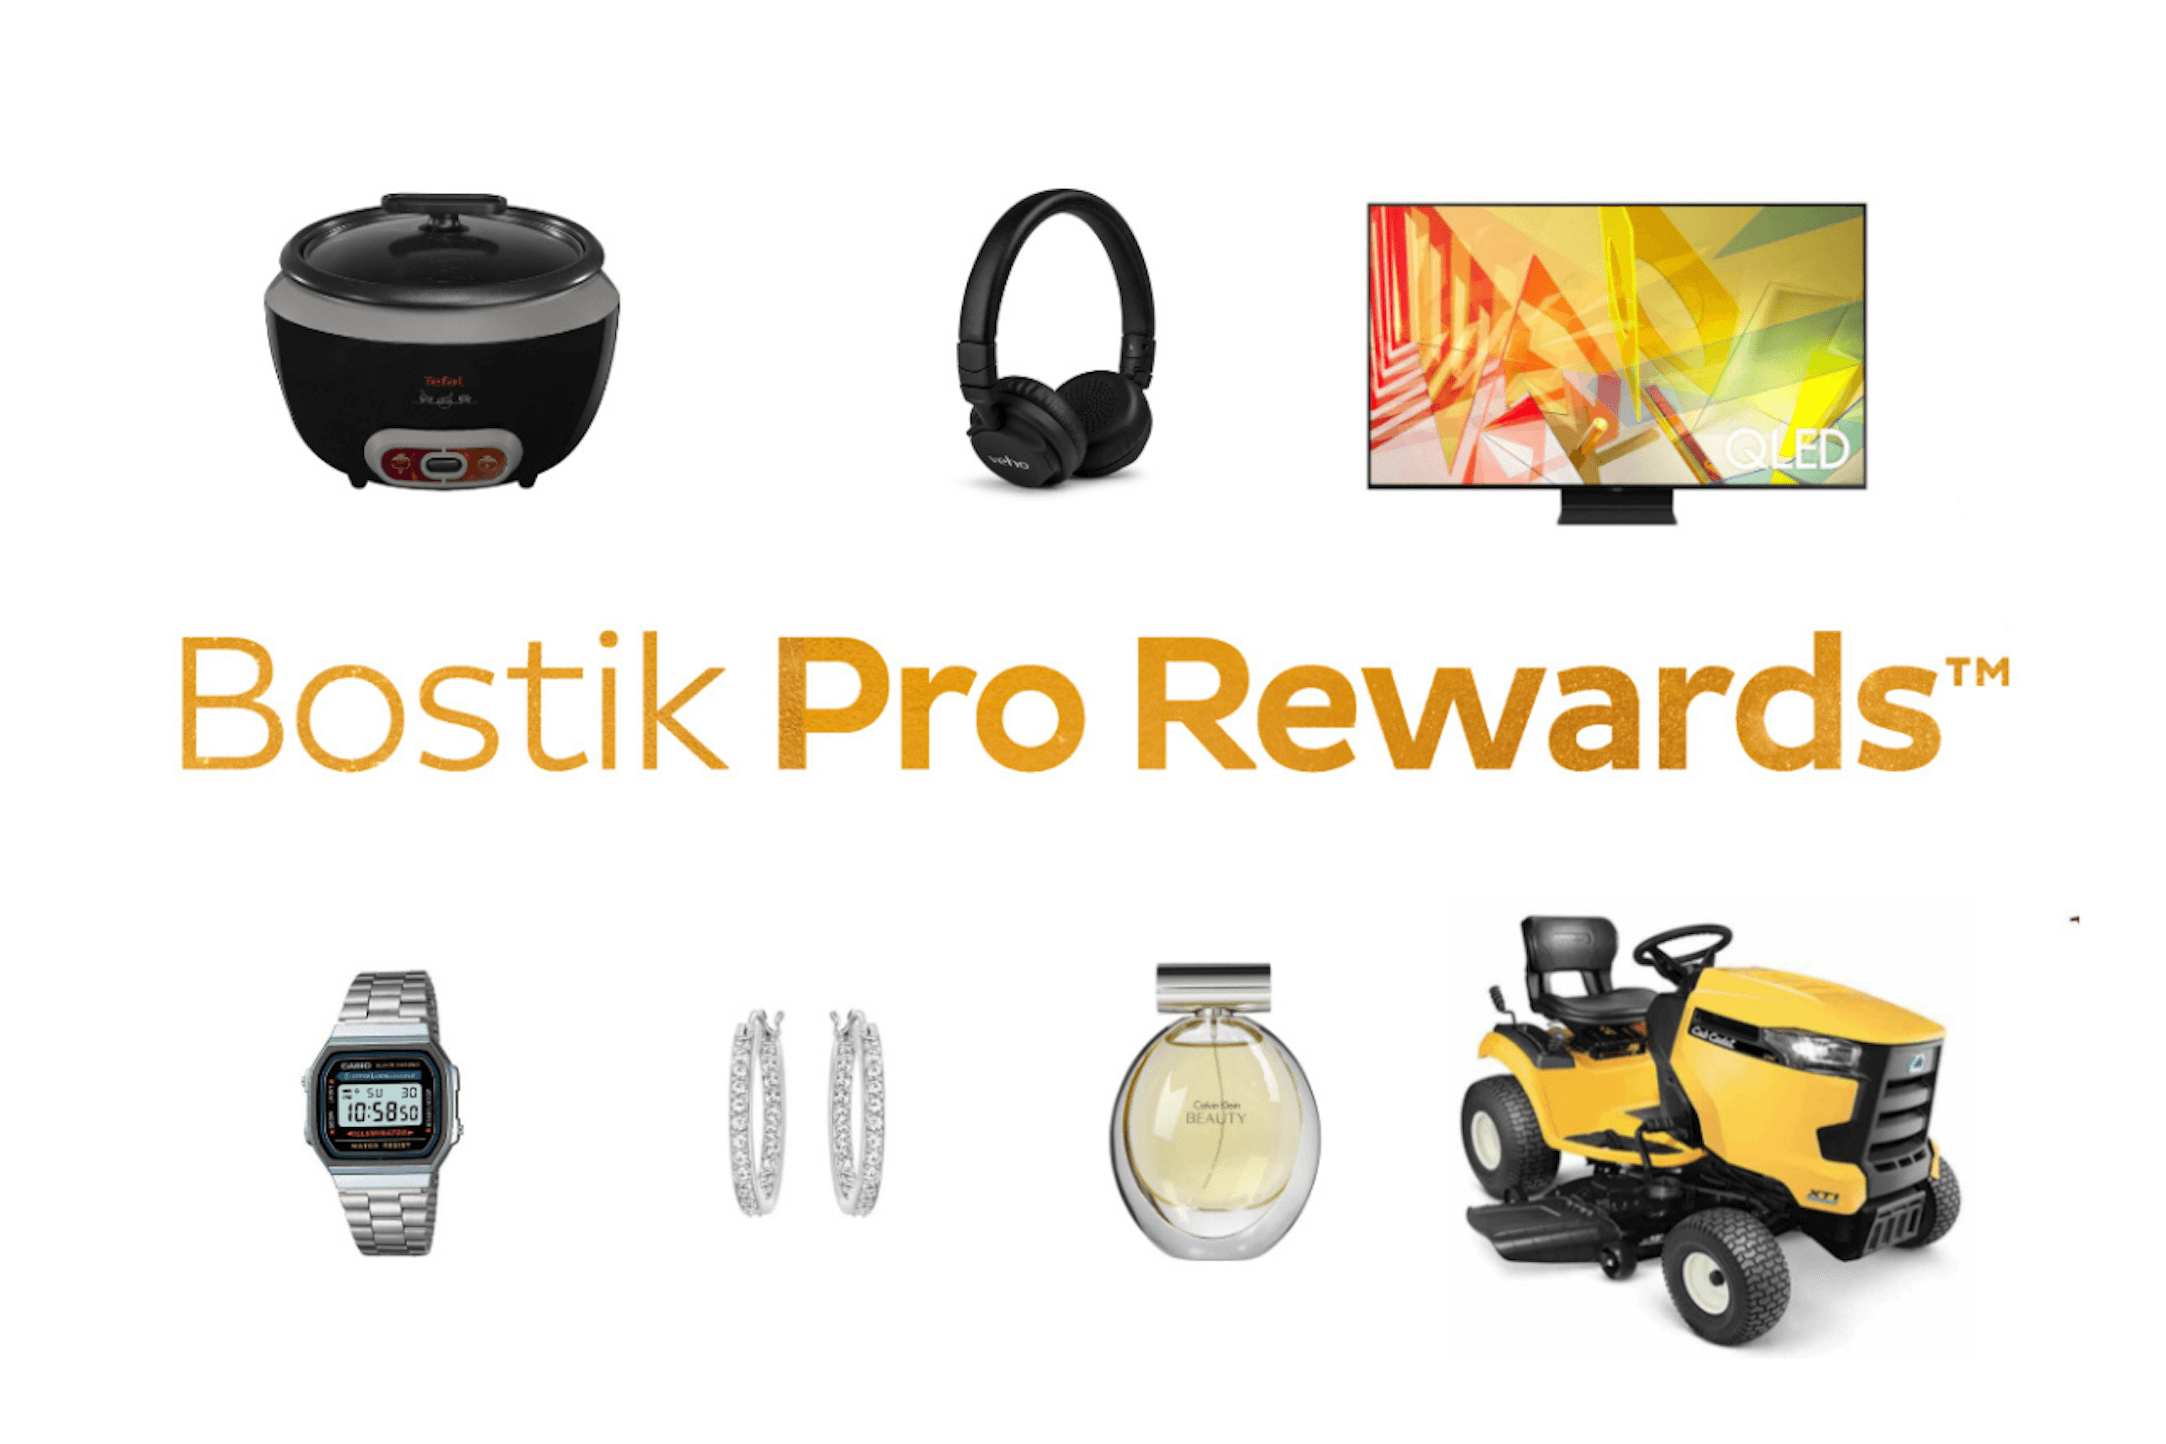 Bostik launches new rewards scheme